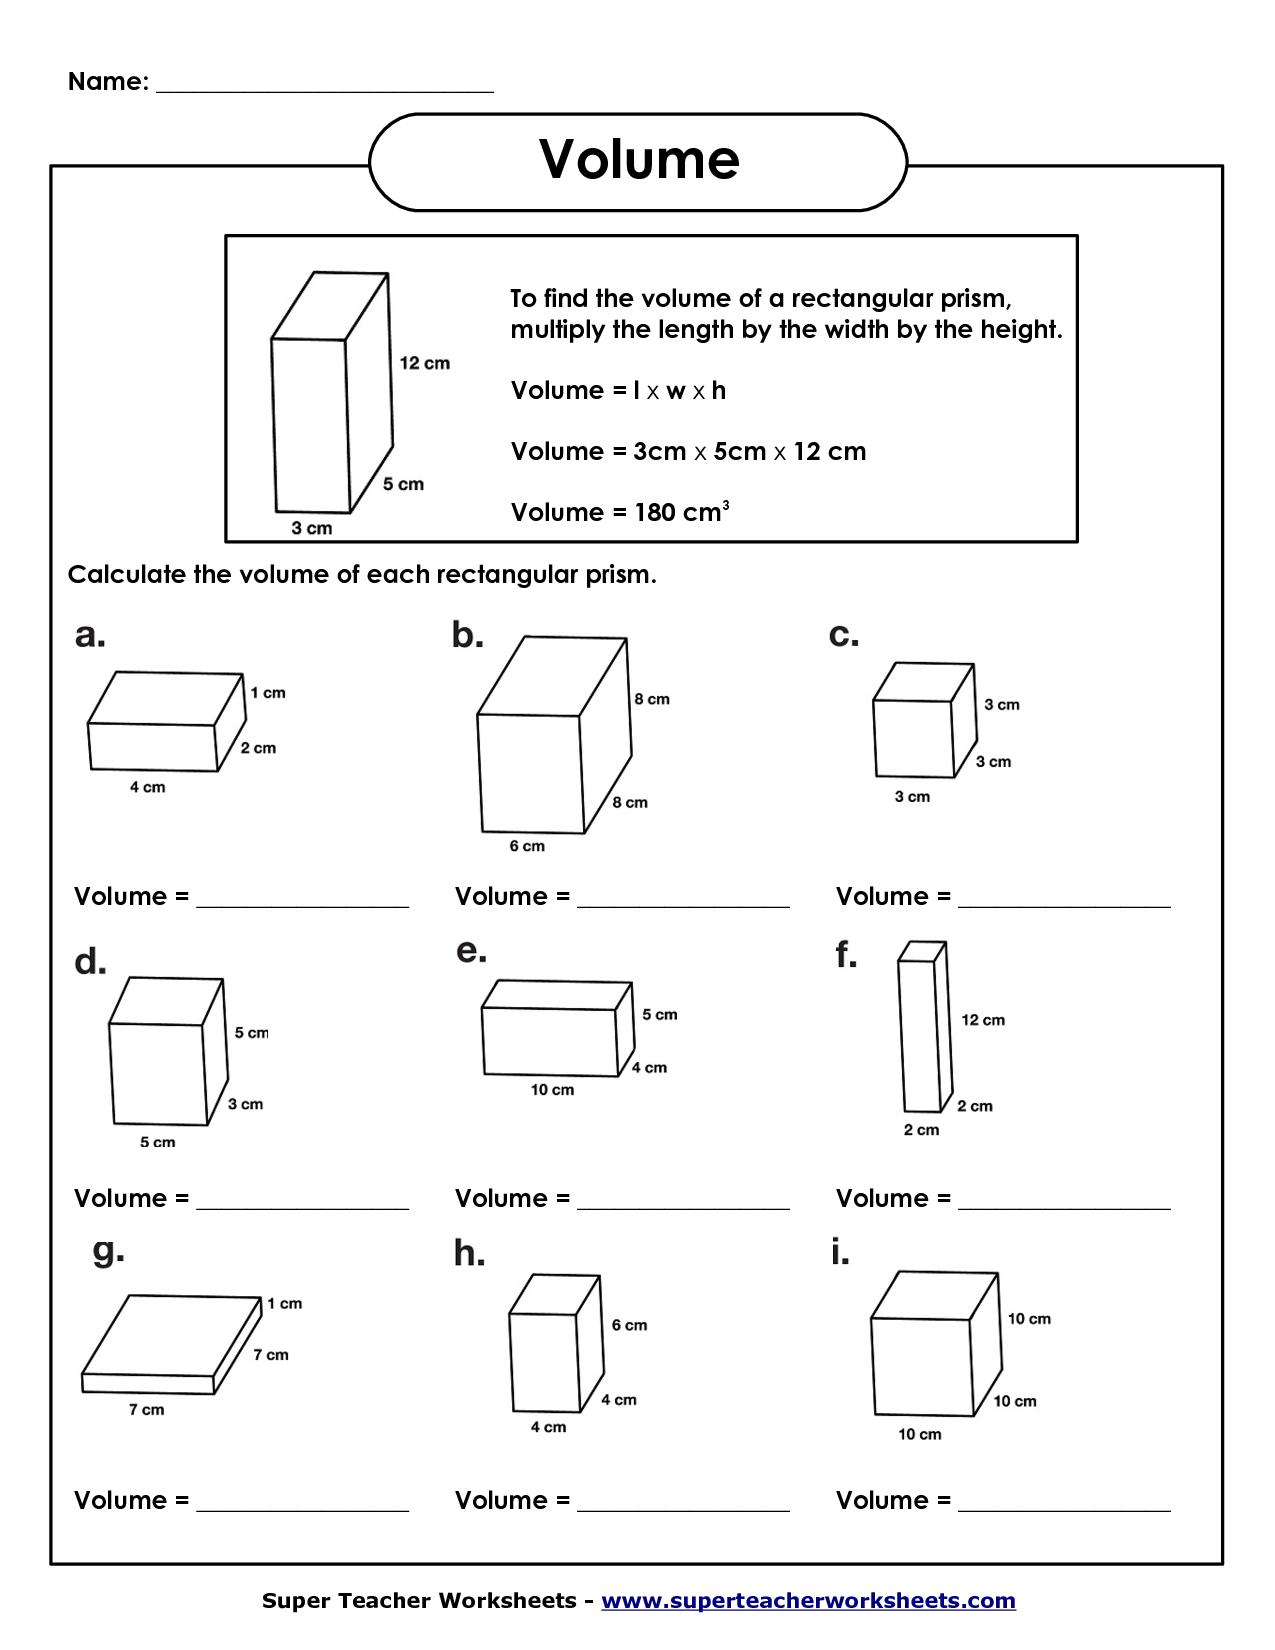 Elementary Math Volume Worksheets 1129162